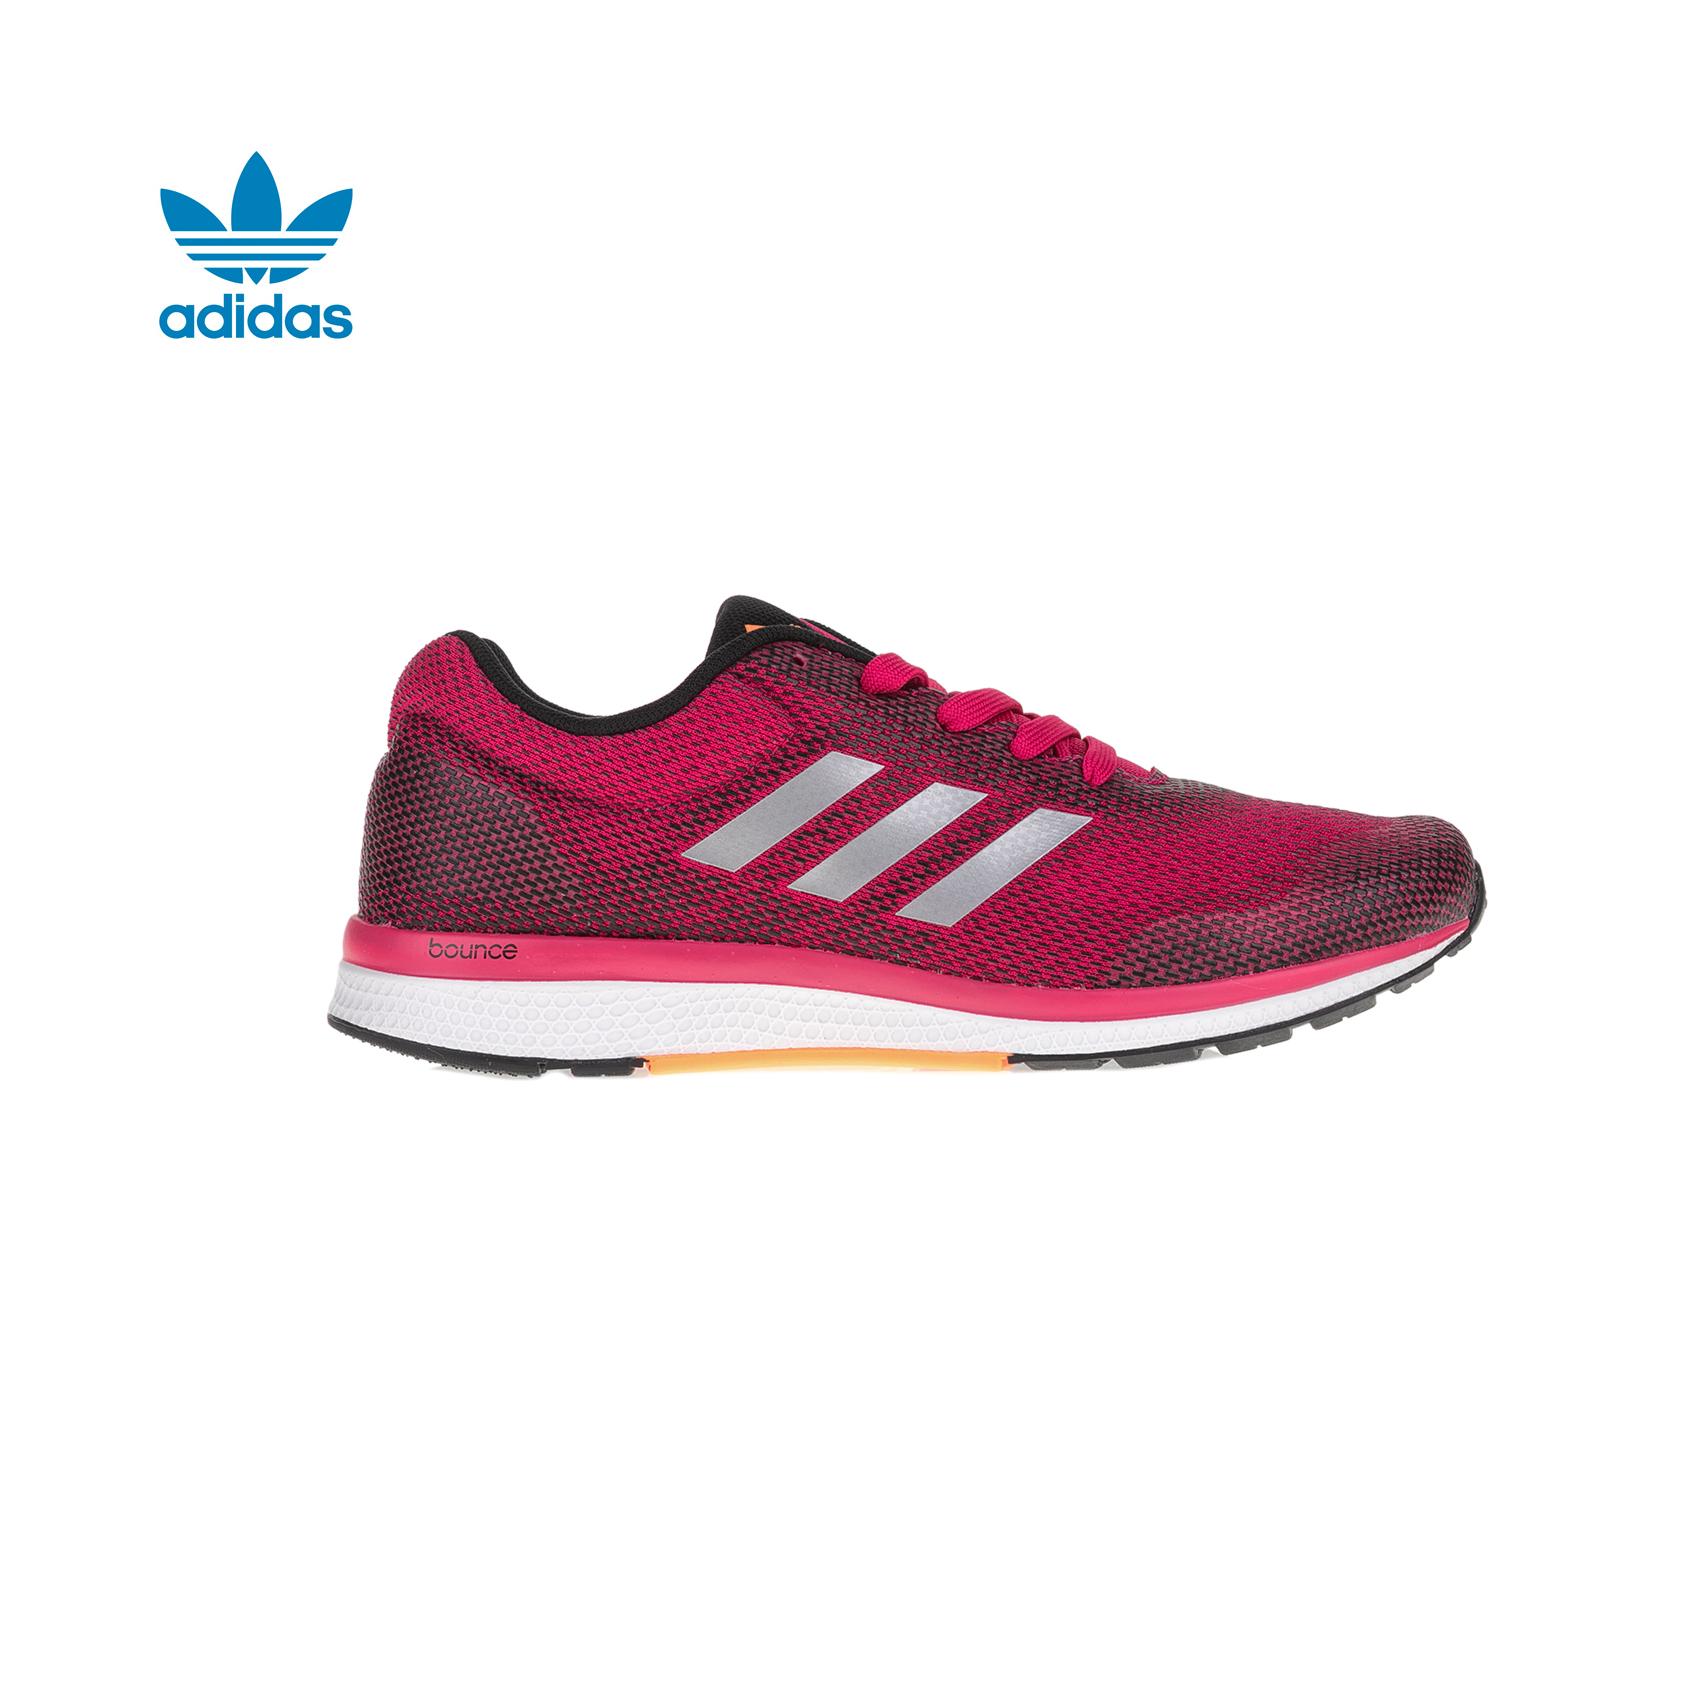 adidas Originals - Γυναικεία παπούτσια adidas mana bounce 2 aramis κόκκινα γυναικεία παπούτσια αθλητικά running